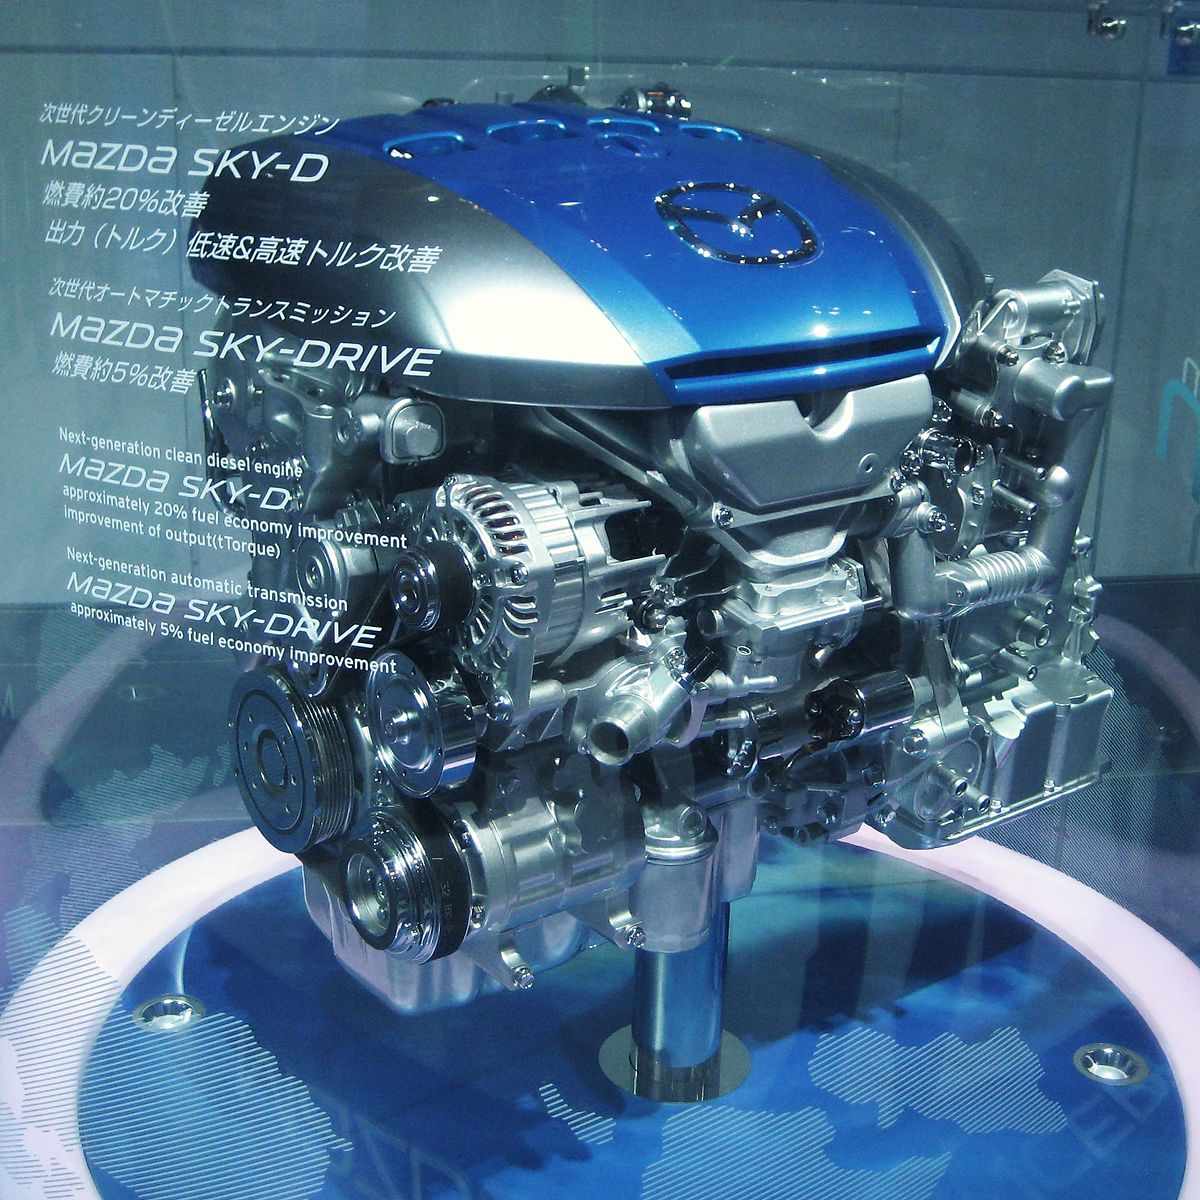 Mazda Diesel engine - Wikipedia